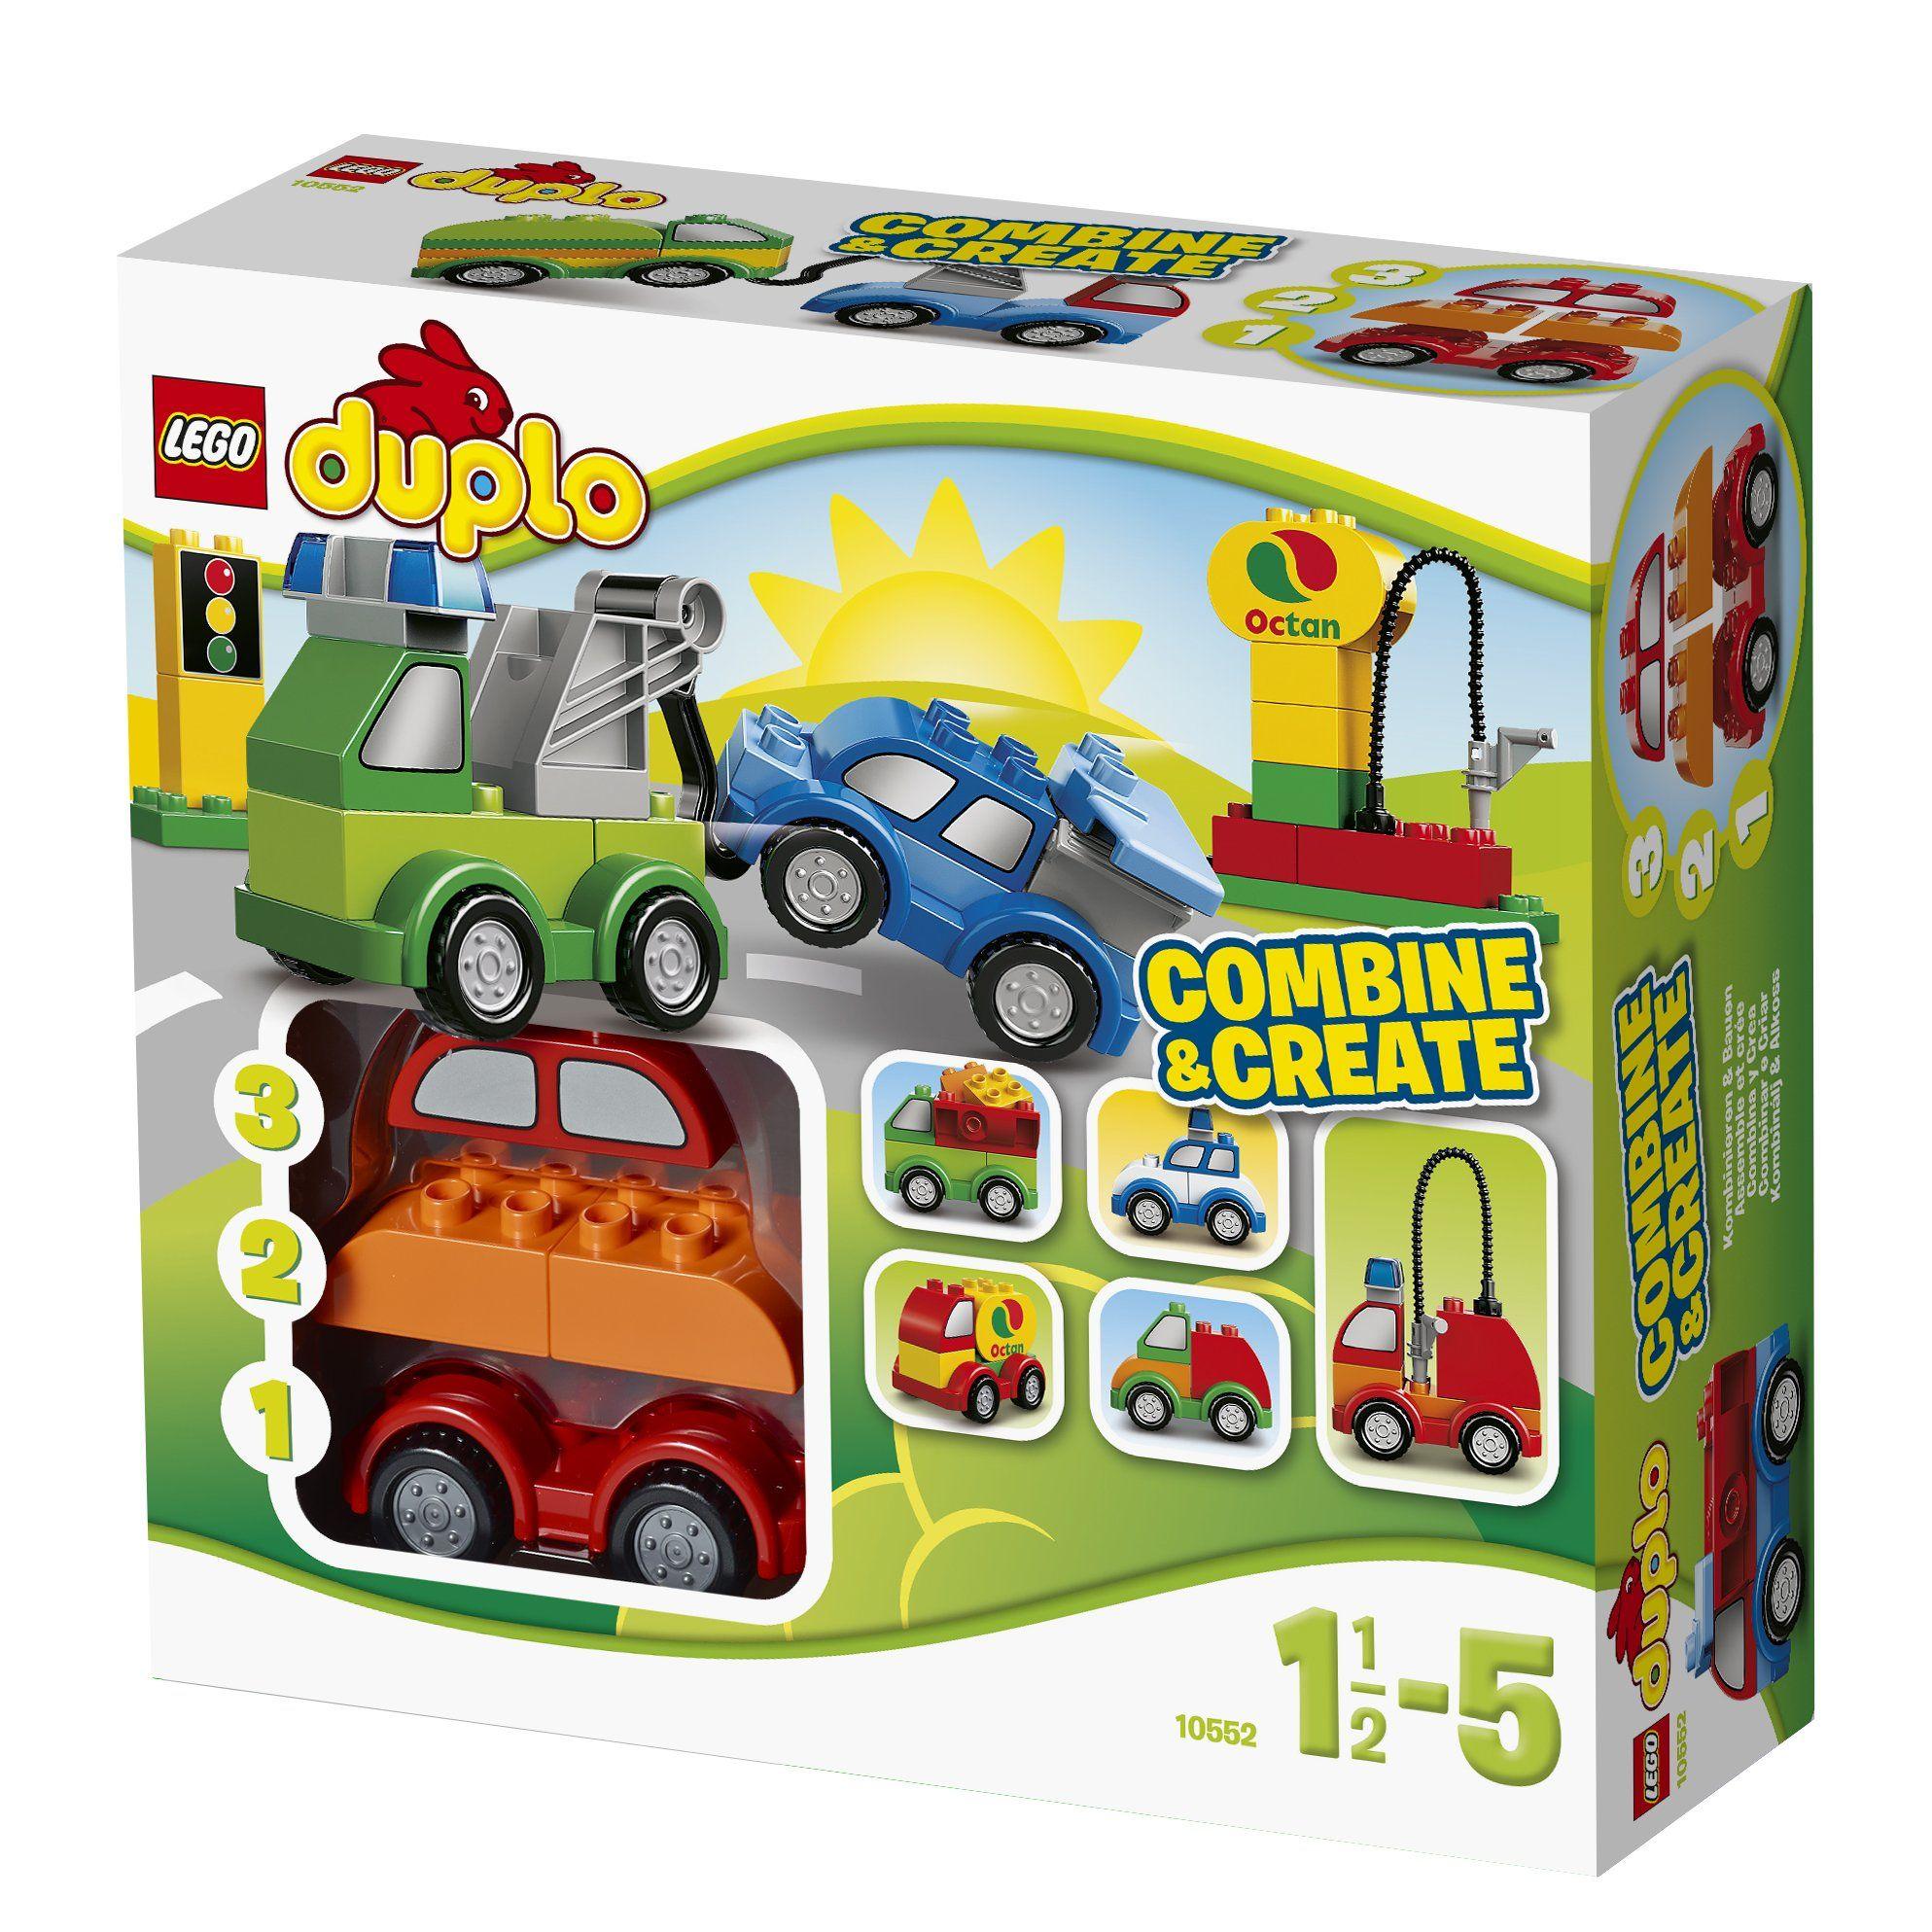 LEGO DUPLO 10552 Creative Cars Amazon.co.uk Toys & Games